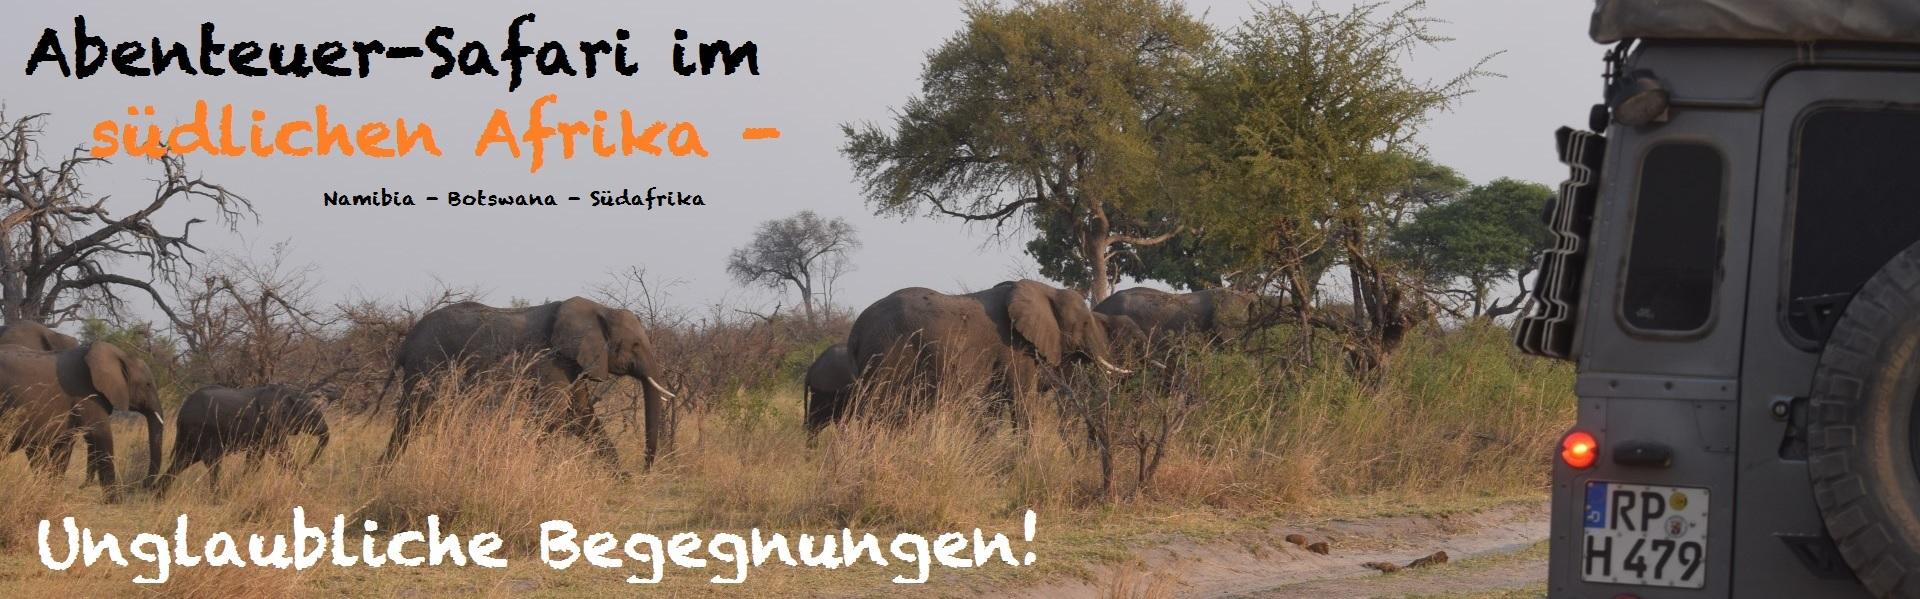 Namibia_Botswana_Safari.jpg